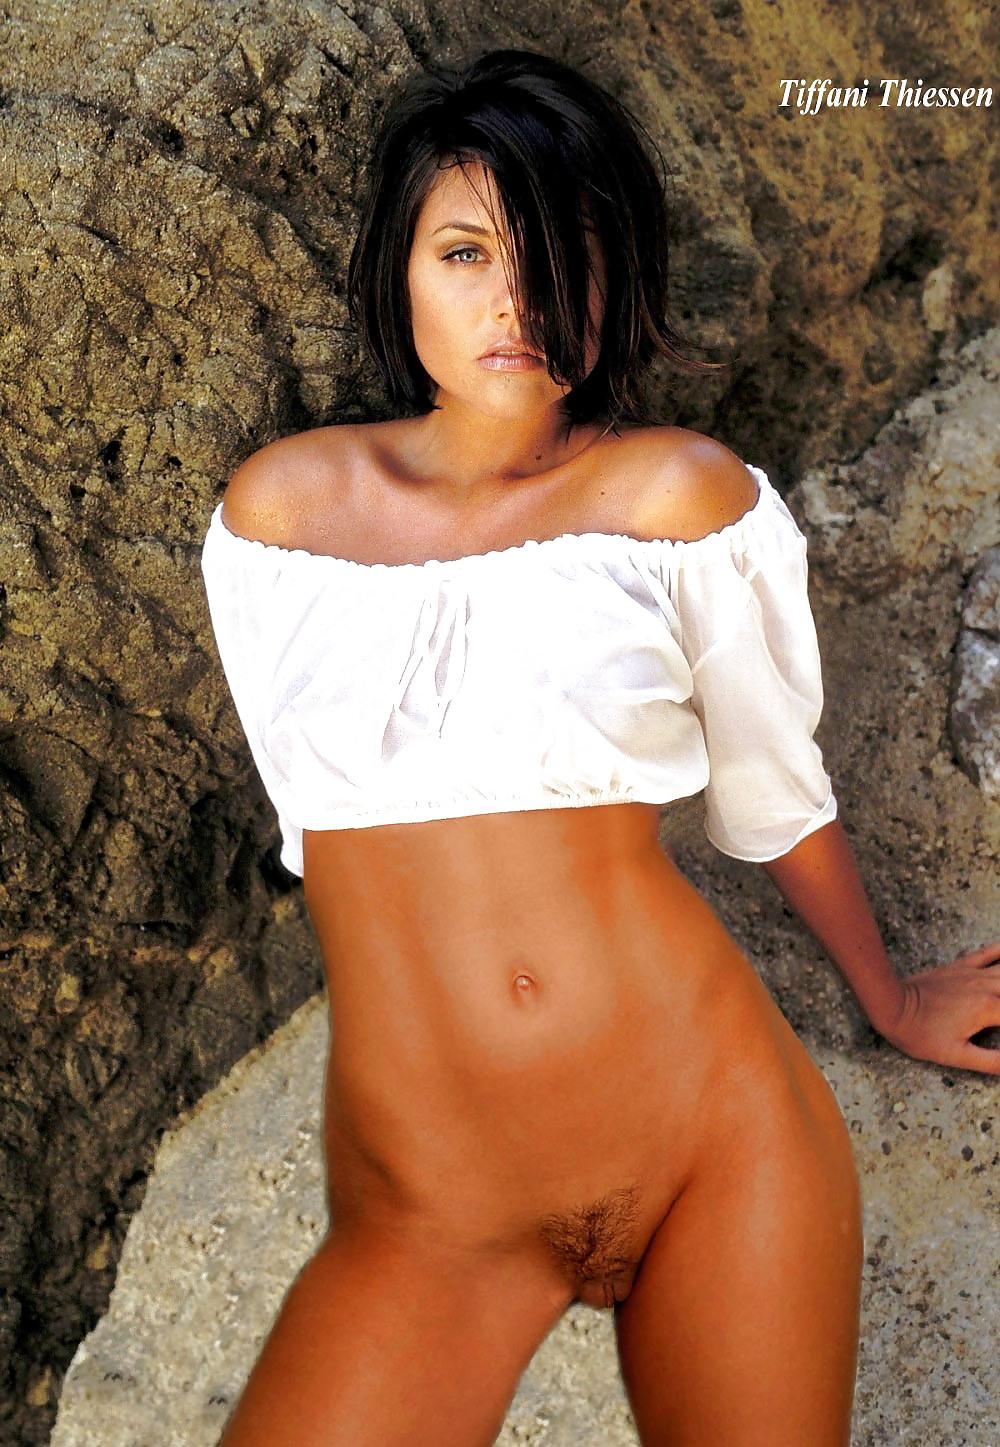 Tiffany Amber Thiessen Sex Scenes